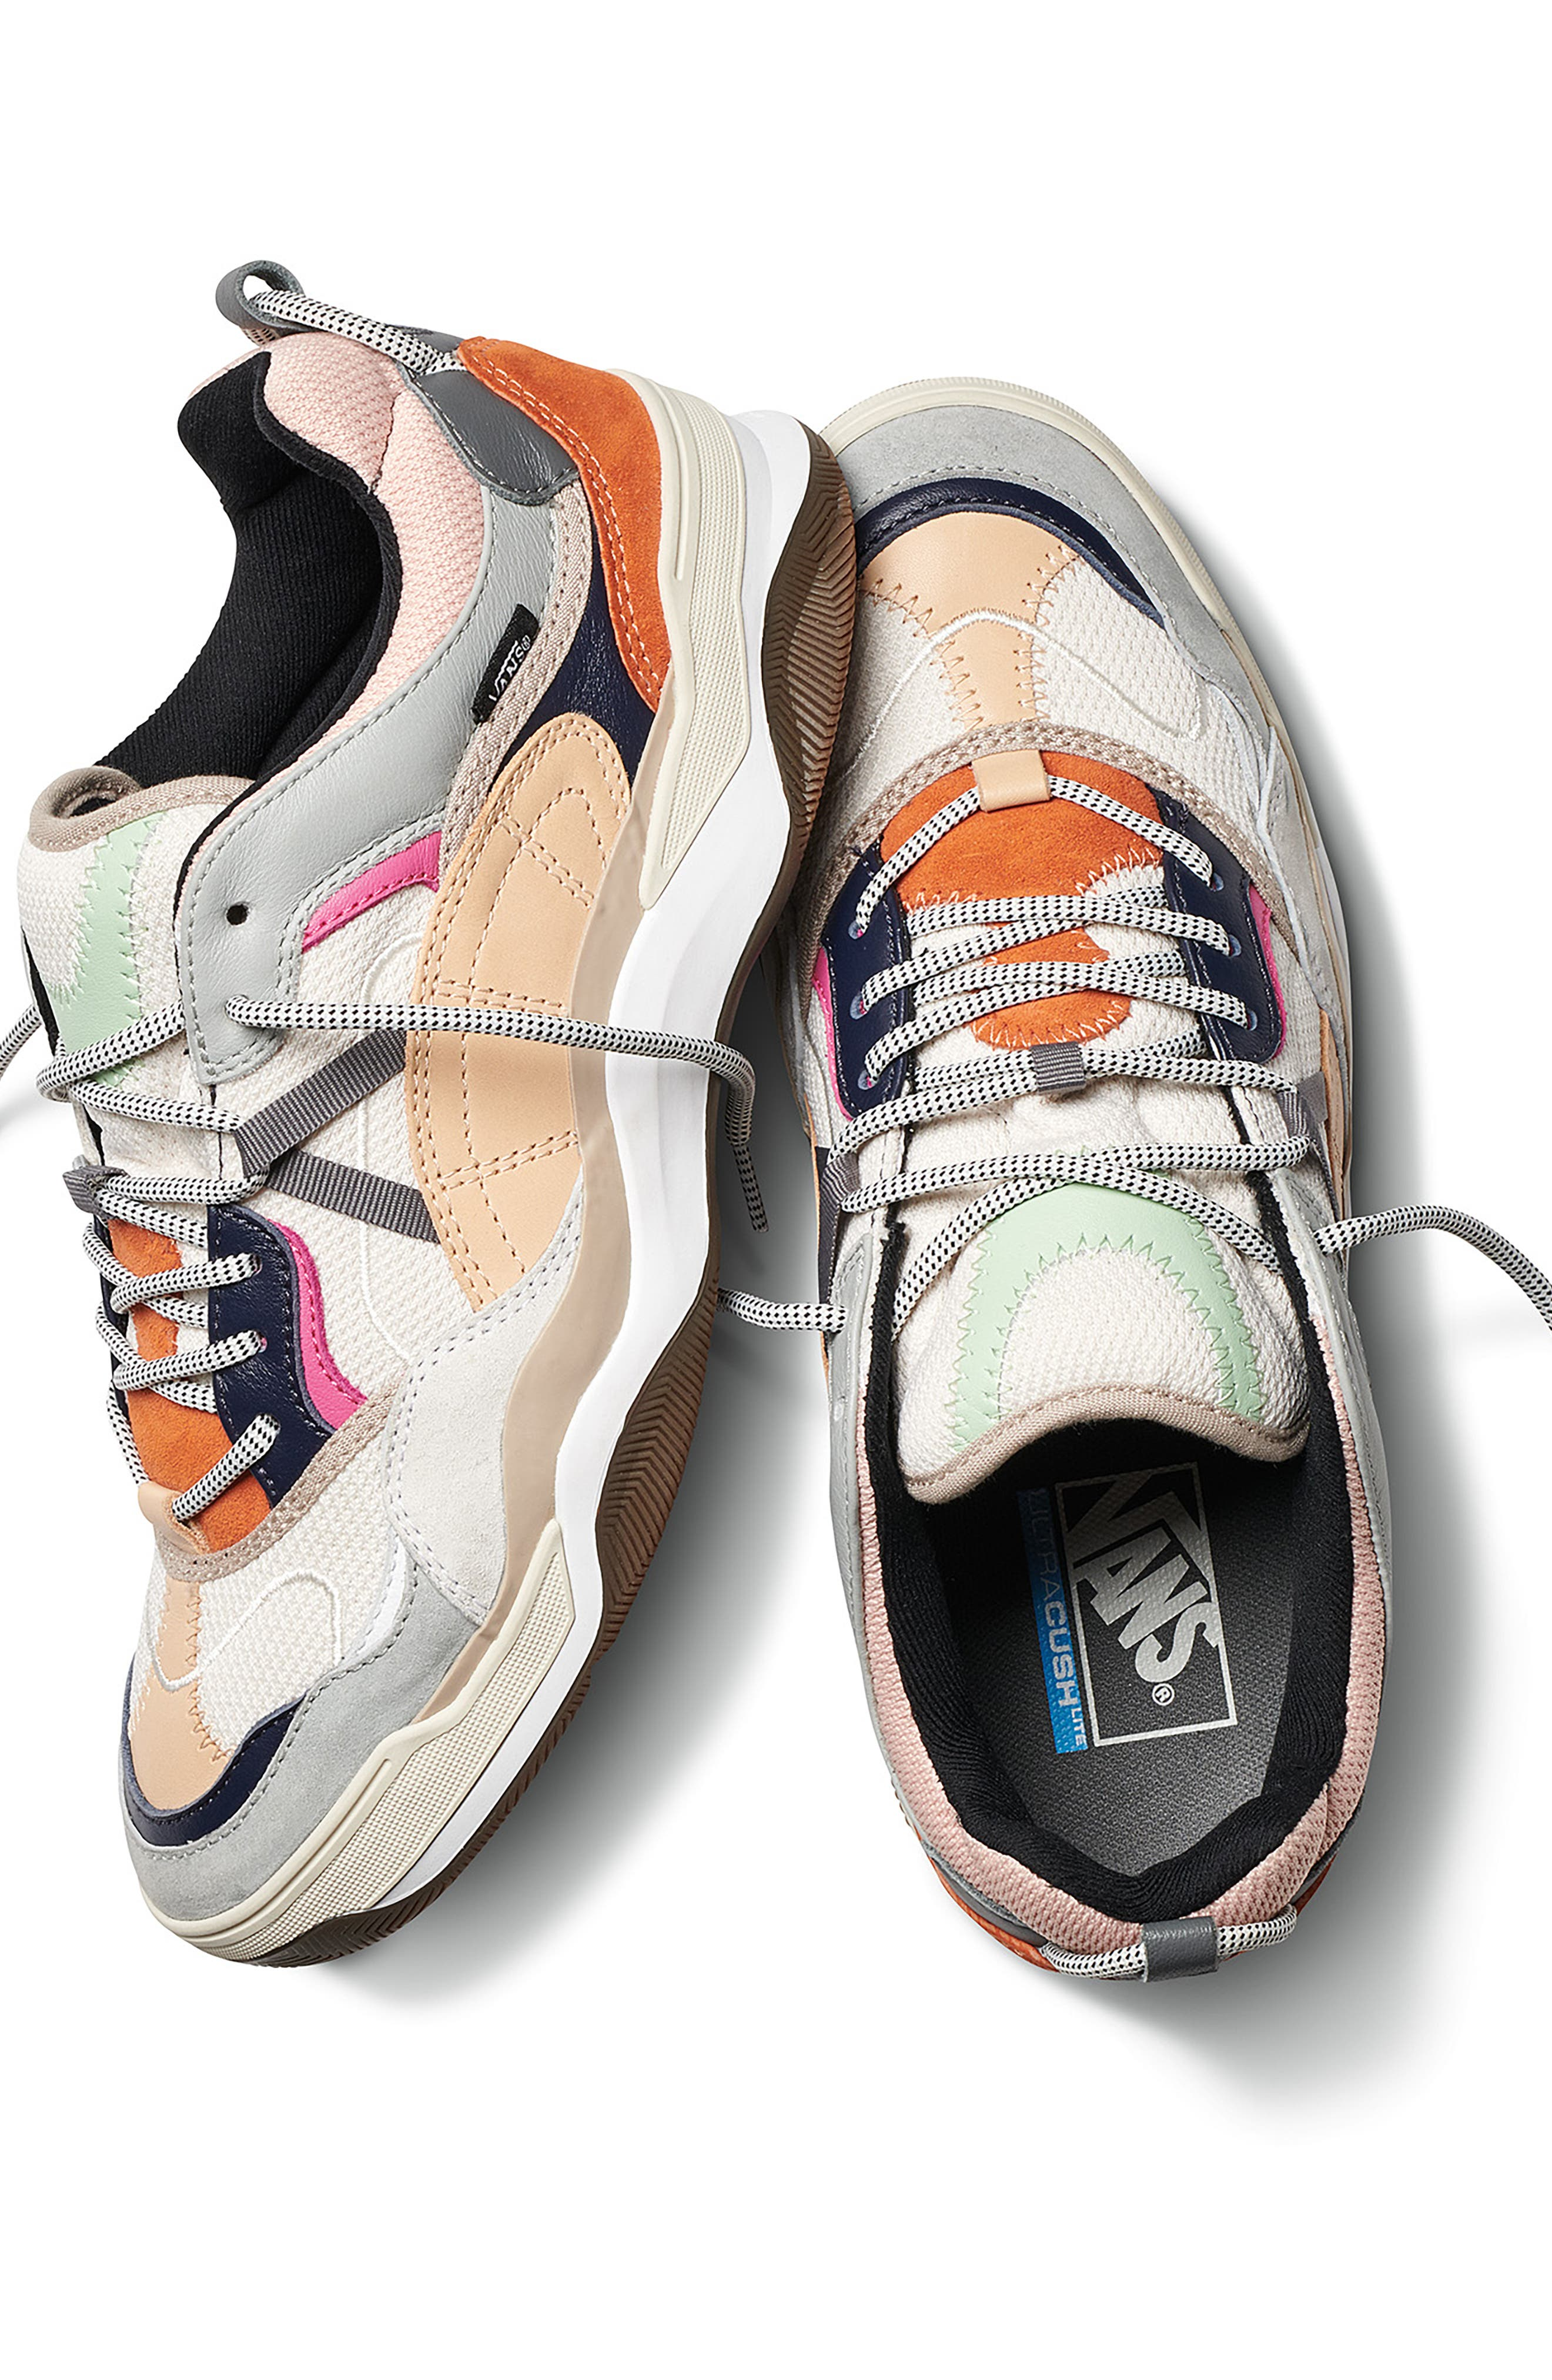 VANS,                             Varix WC Sneaker,                             Alternate thumbnail 11, color,                             TURTLEDOVE/ TRUE WHITE LEATHER